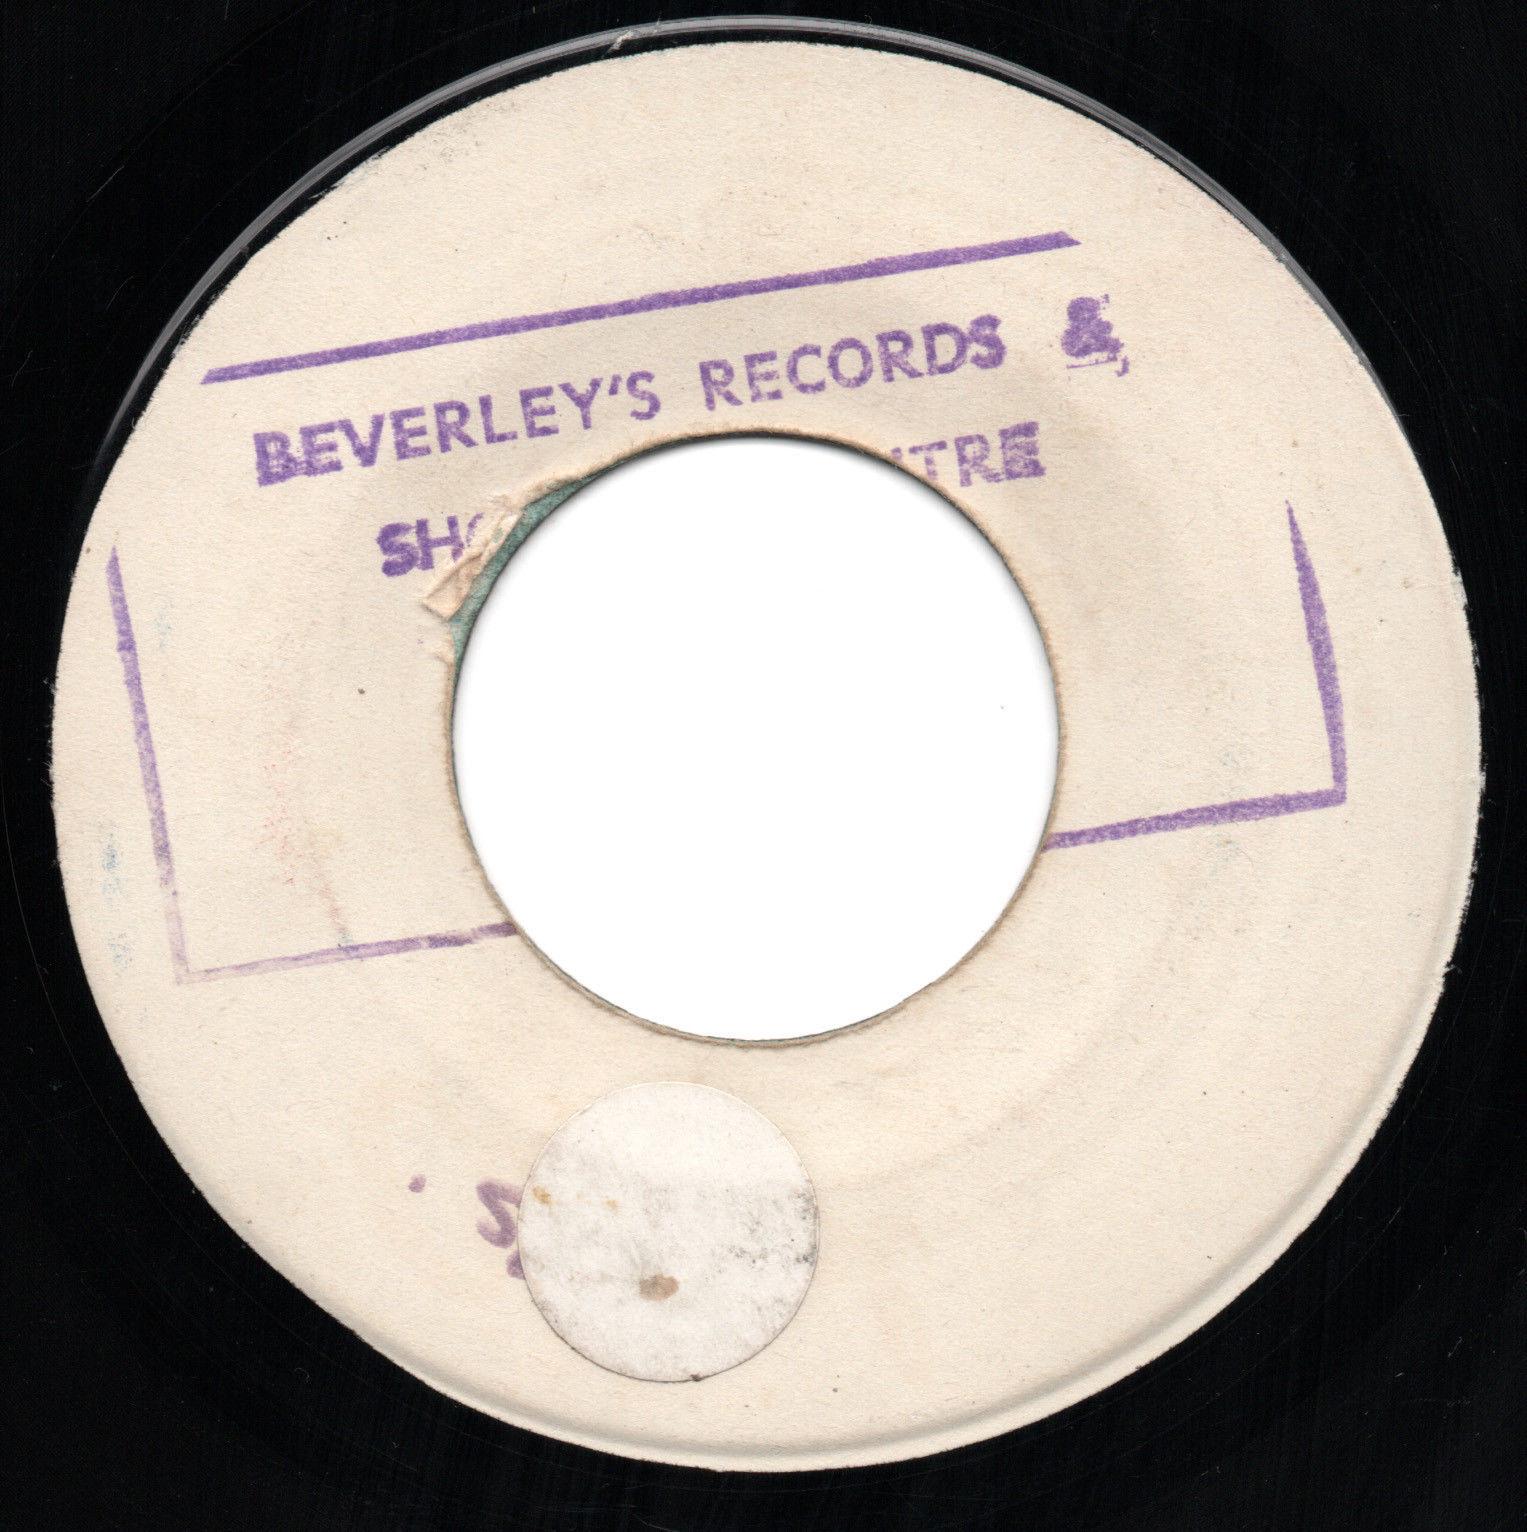 VERY RARE 1970 REGGAE SOUL - PEACE LOVE UNDERSTANDING - THE GAYLADS BEVERLEY'S